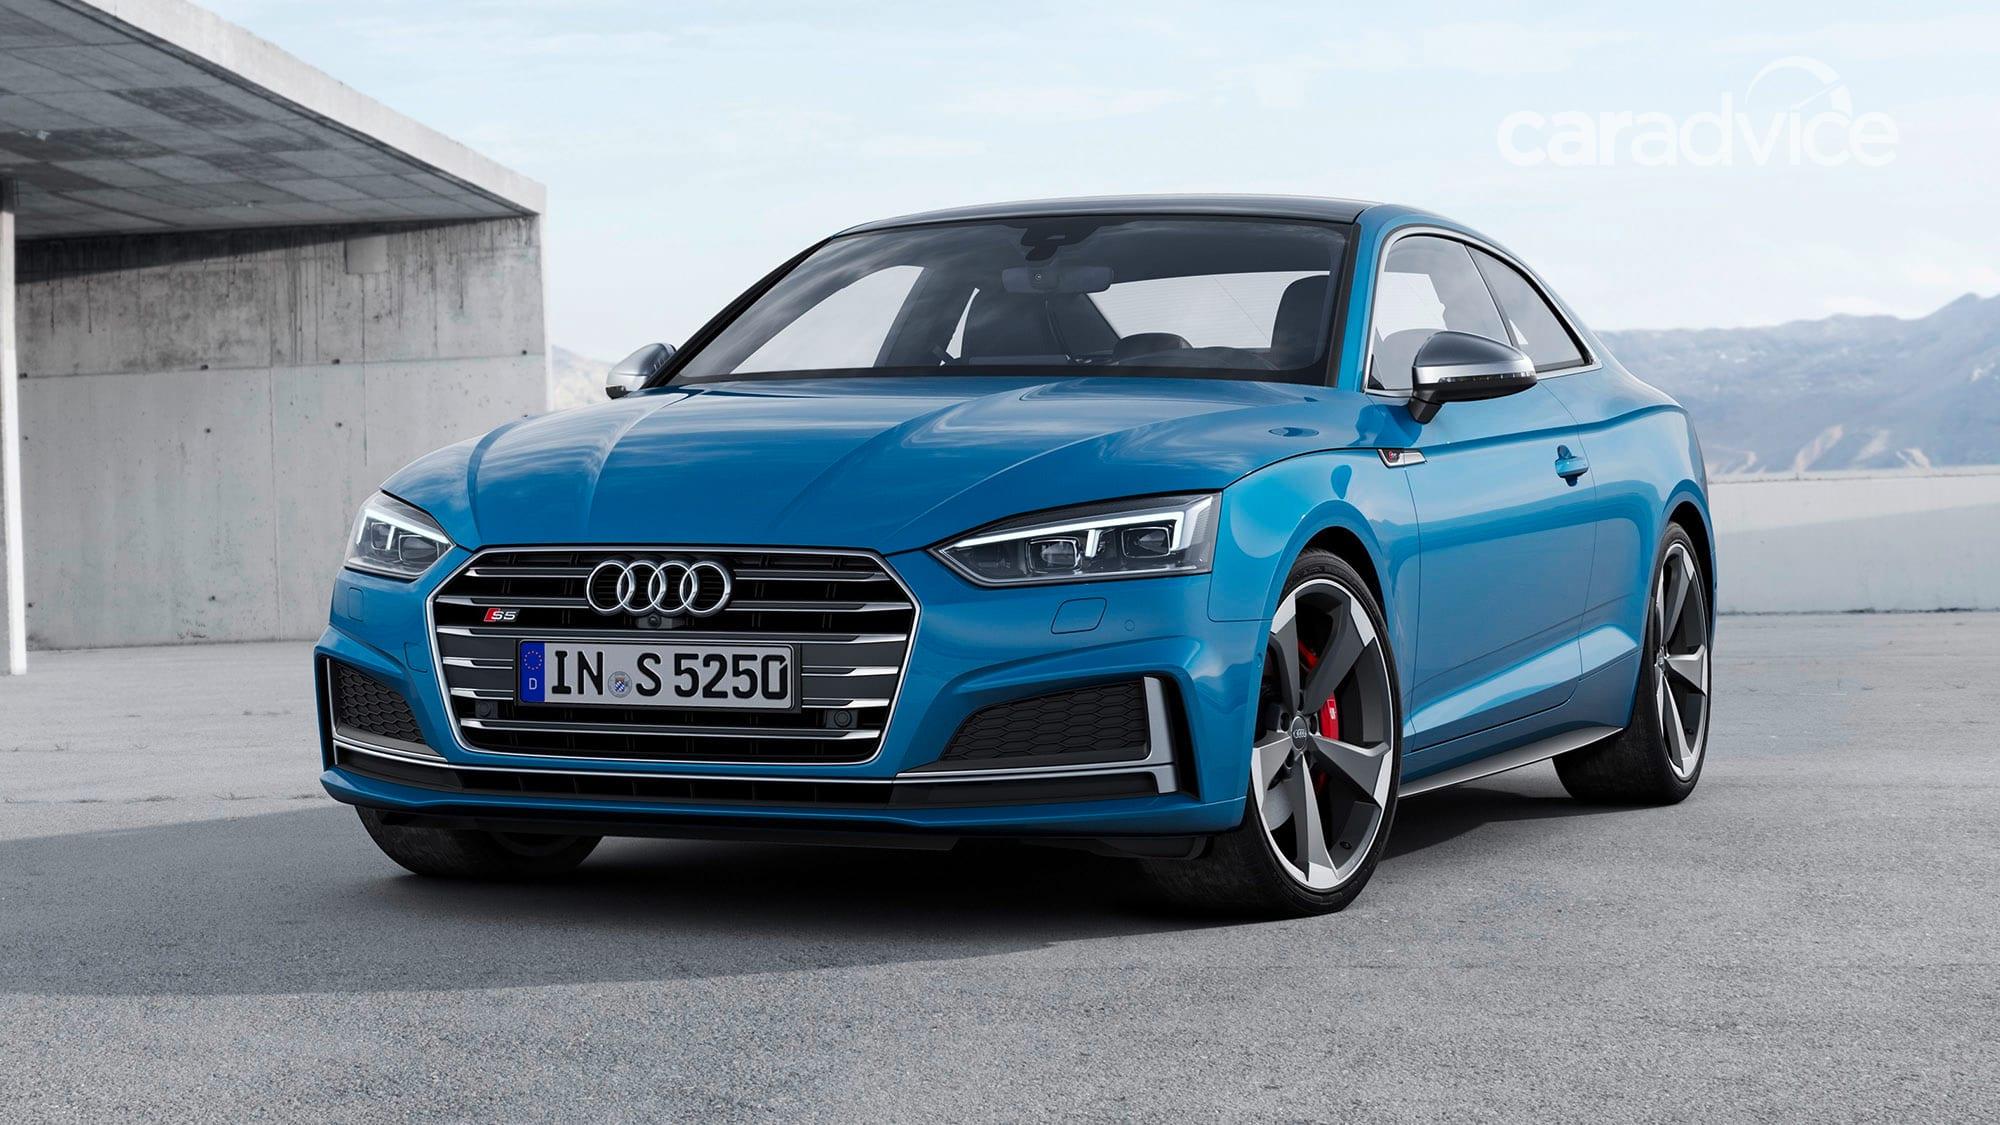 2019 Audi S5 TDI revealed, not for Australia   CarAdvice